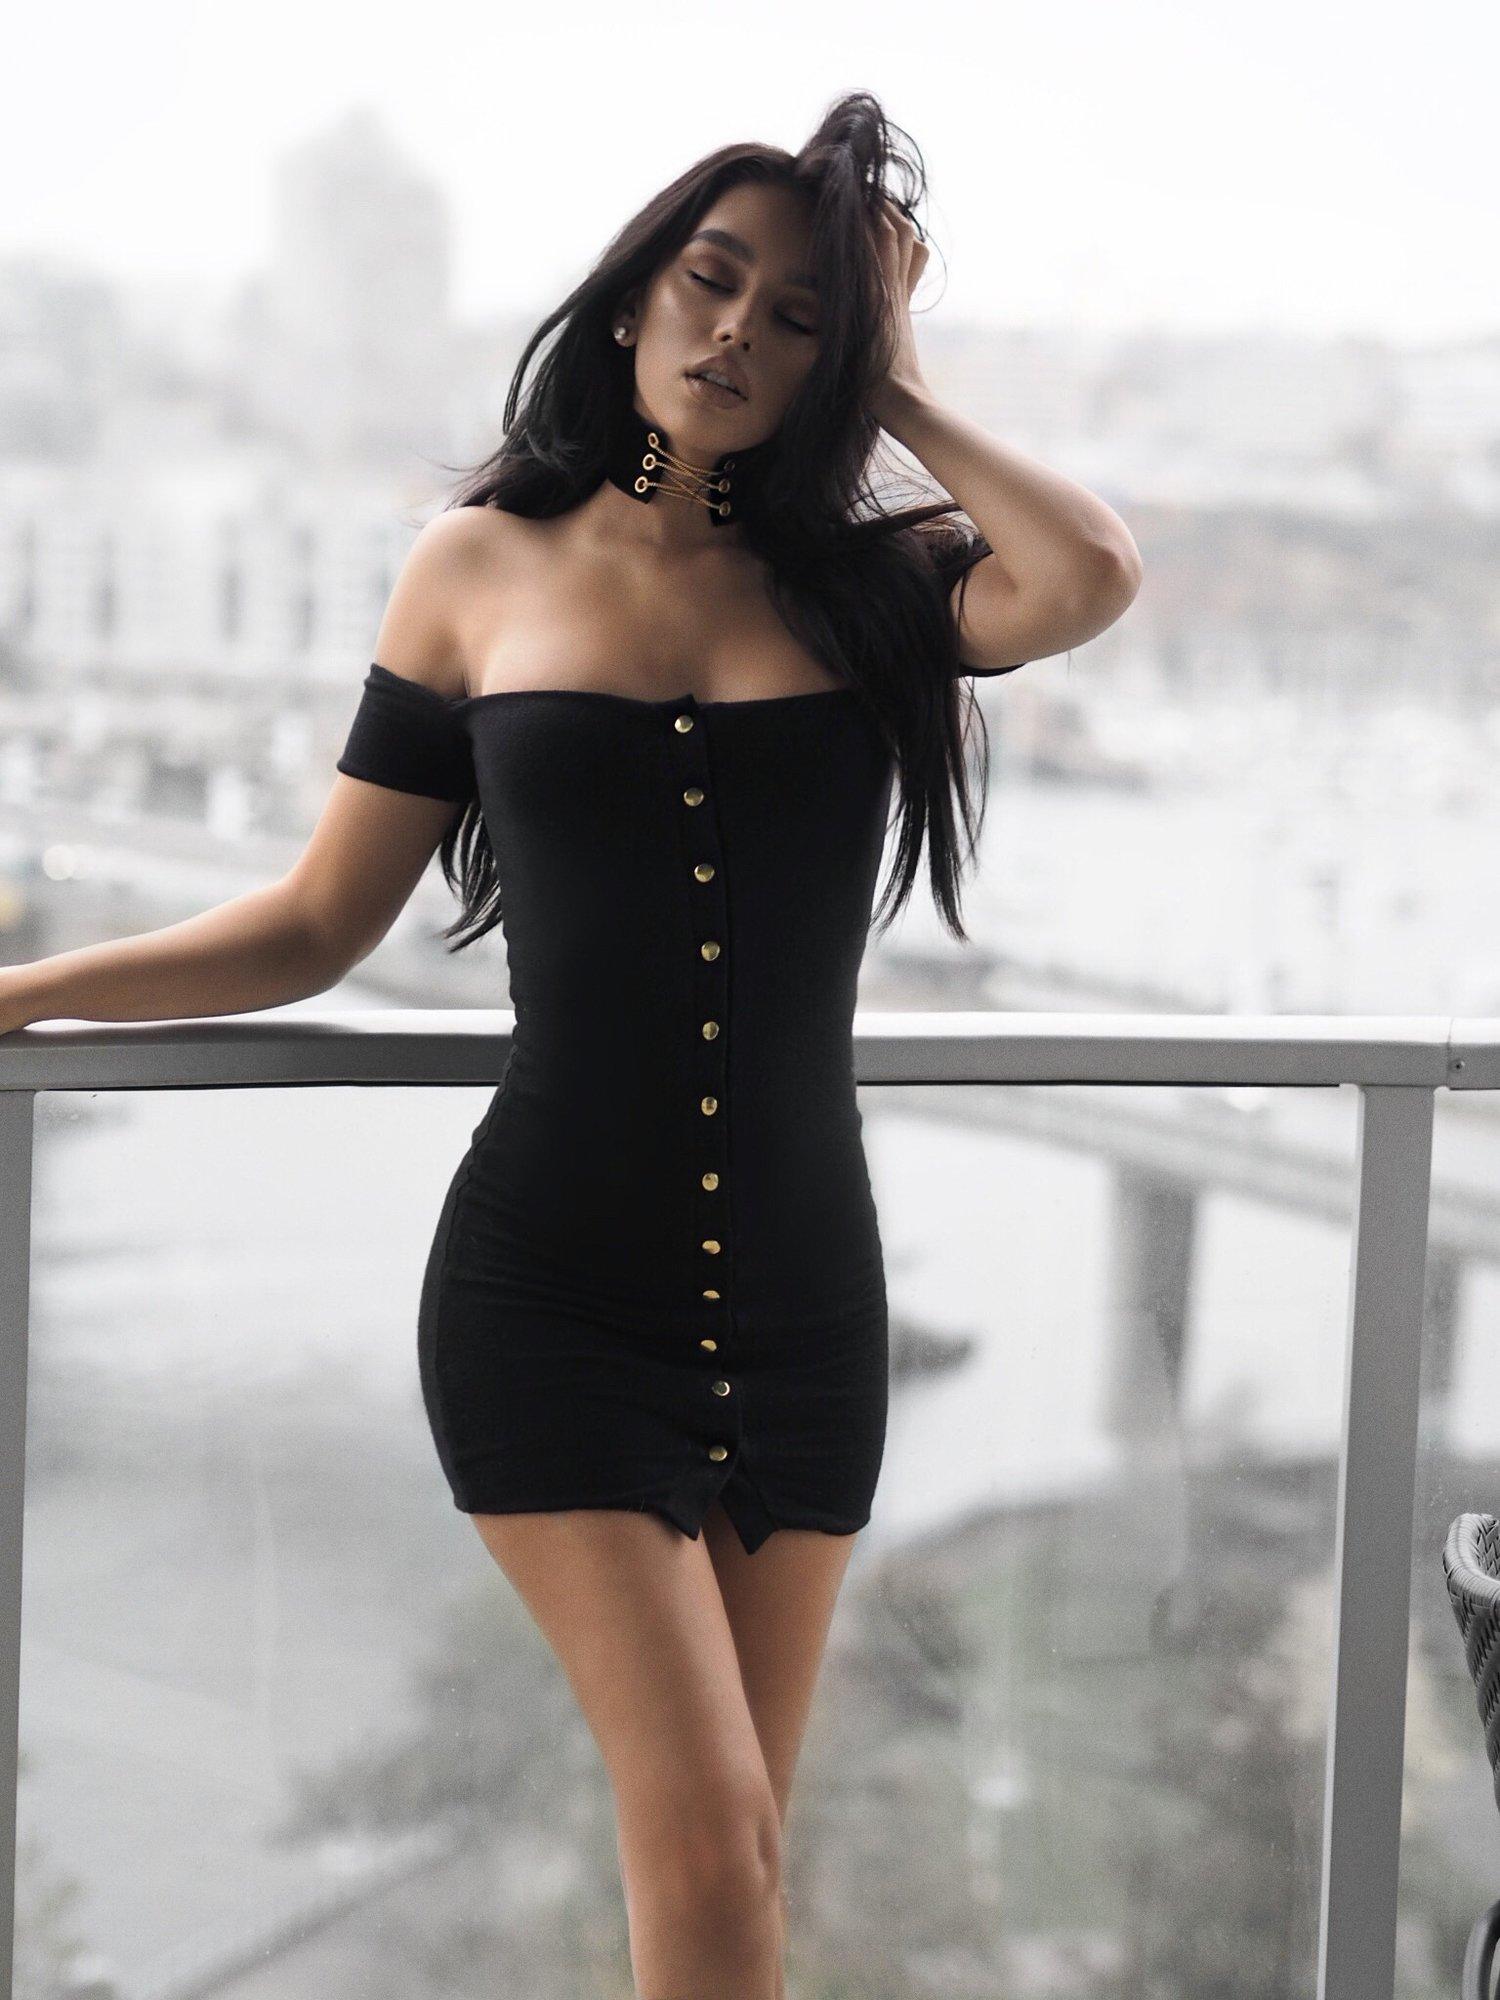 Sexy LBD — JANICE JOOSTEMA Janice Joostema